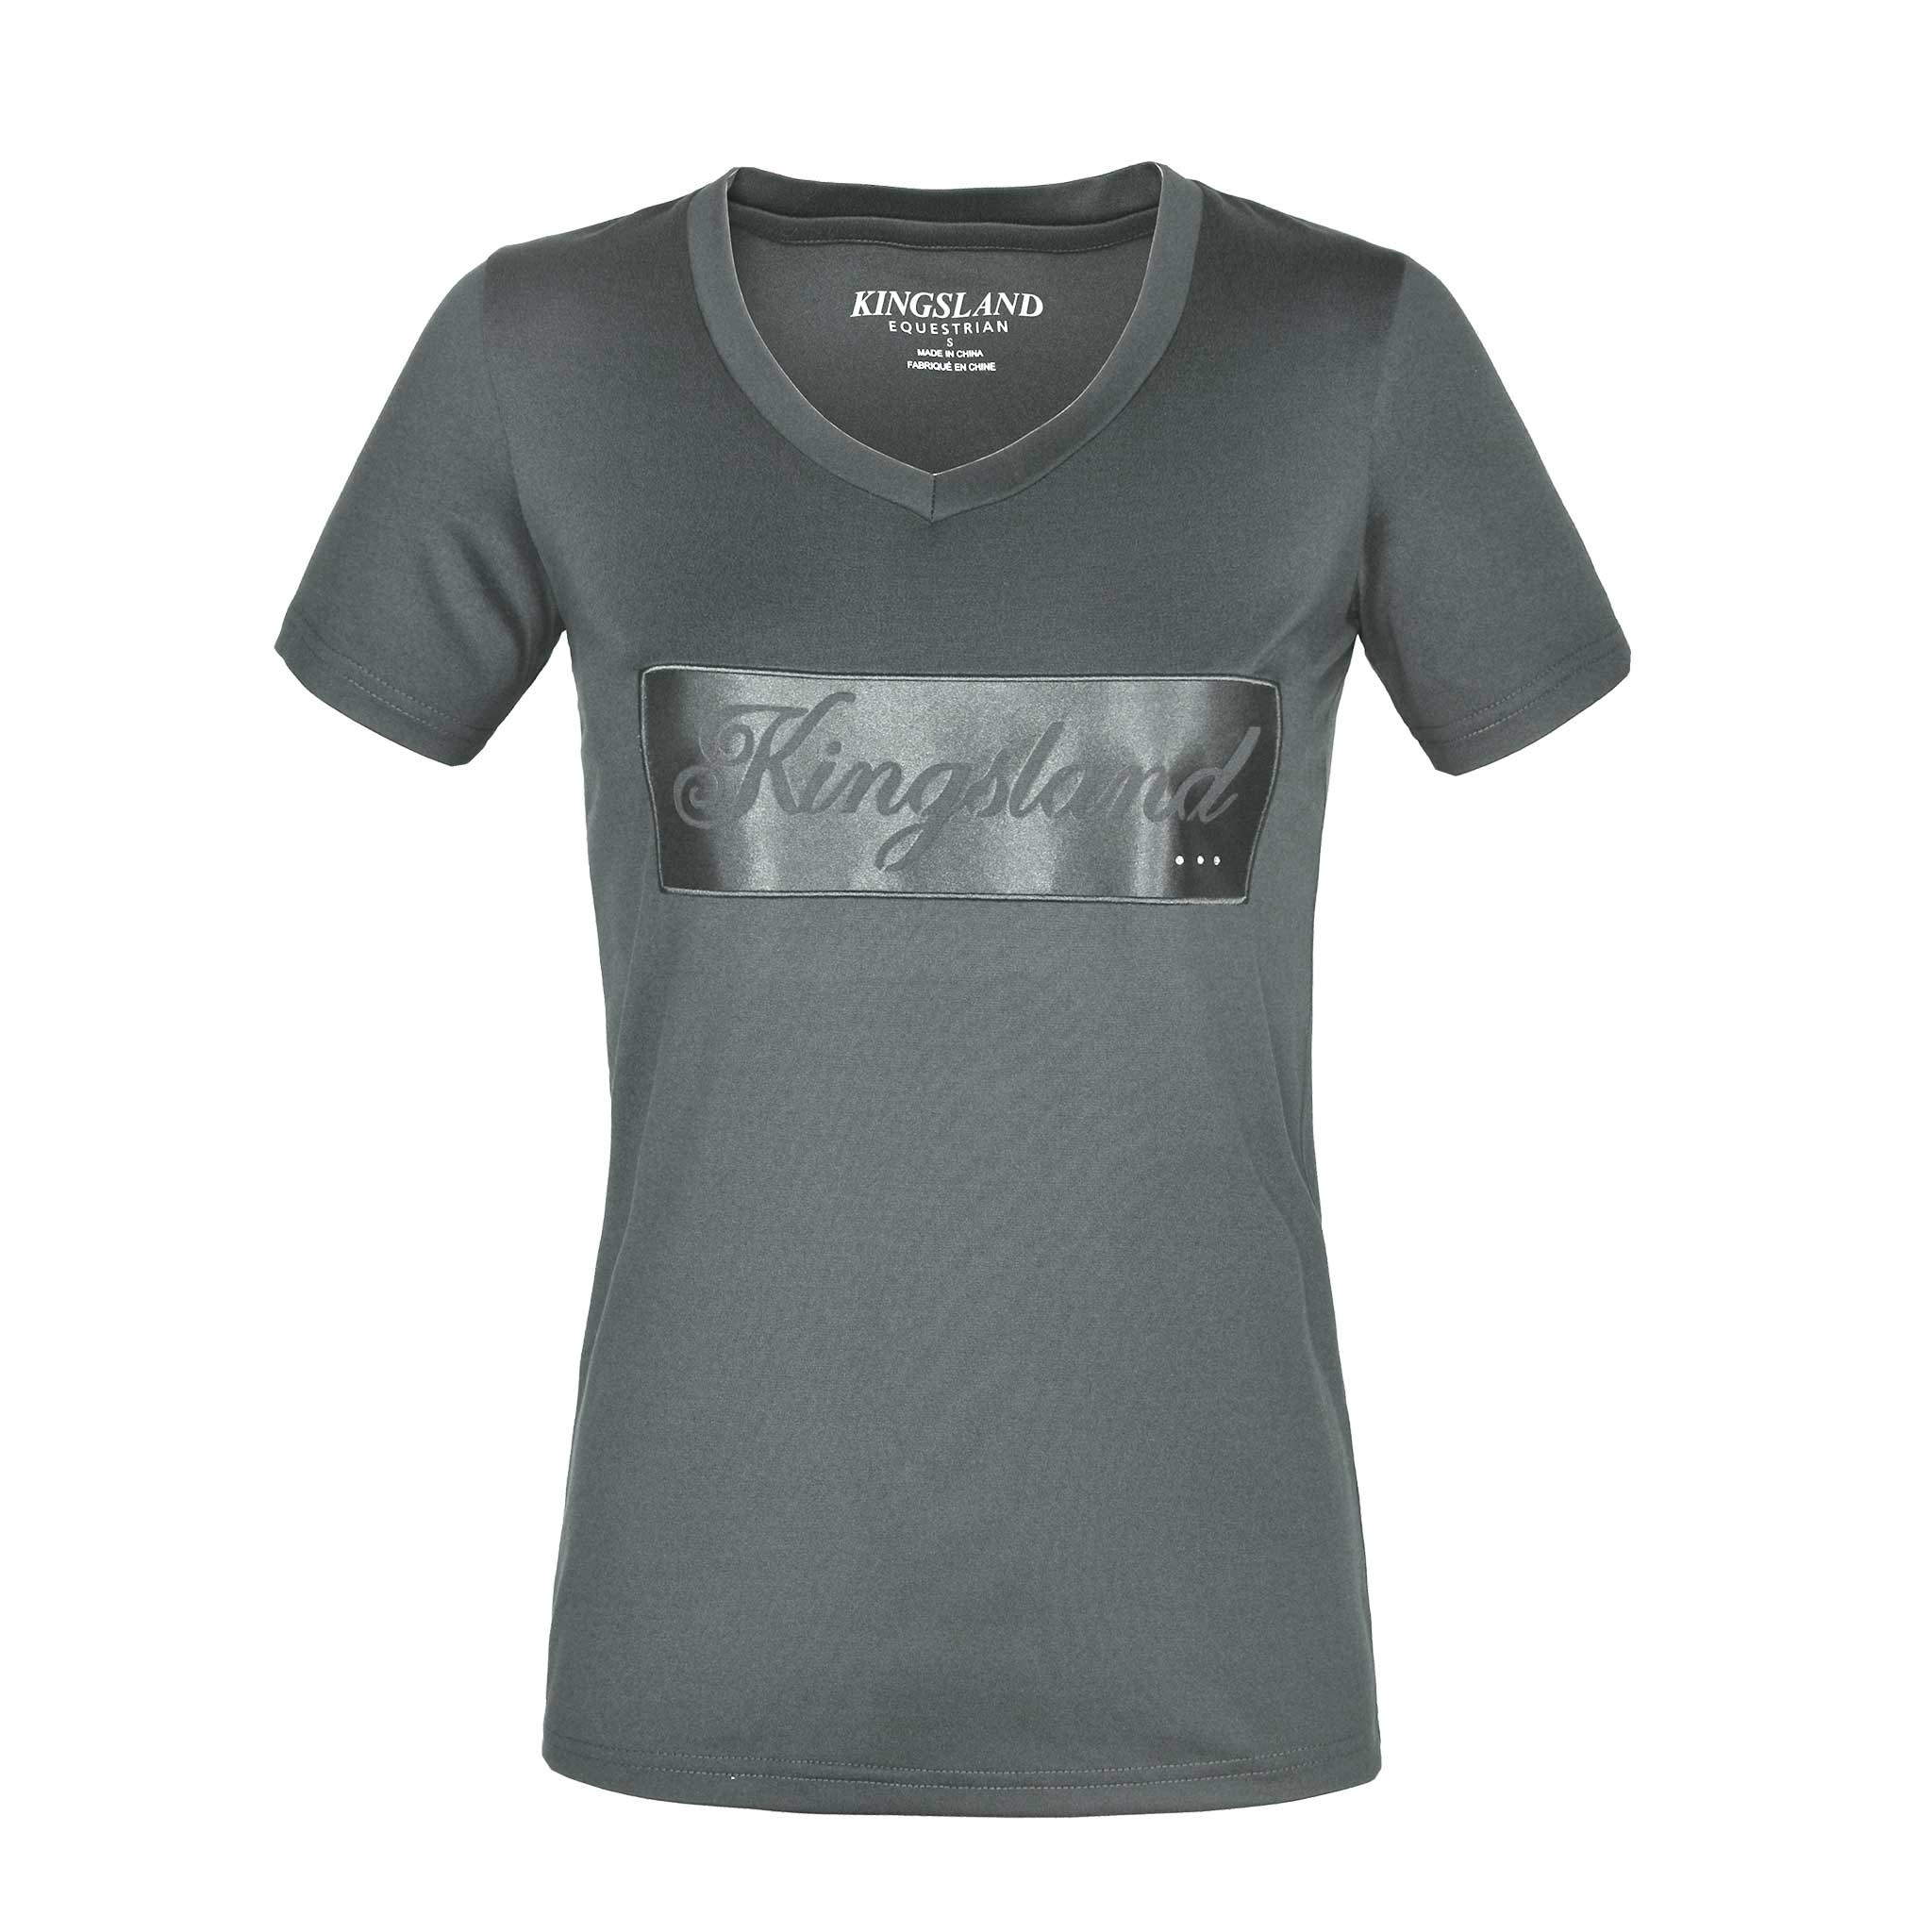 t-shirt-green-agave